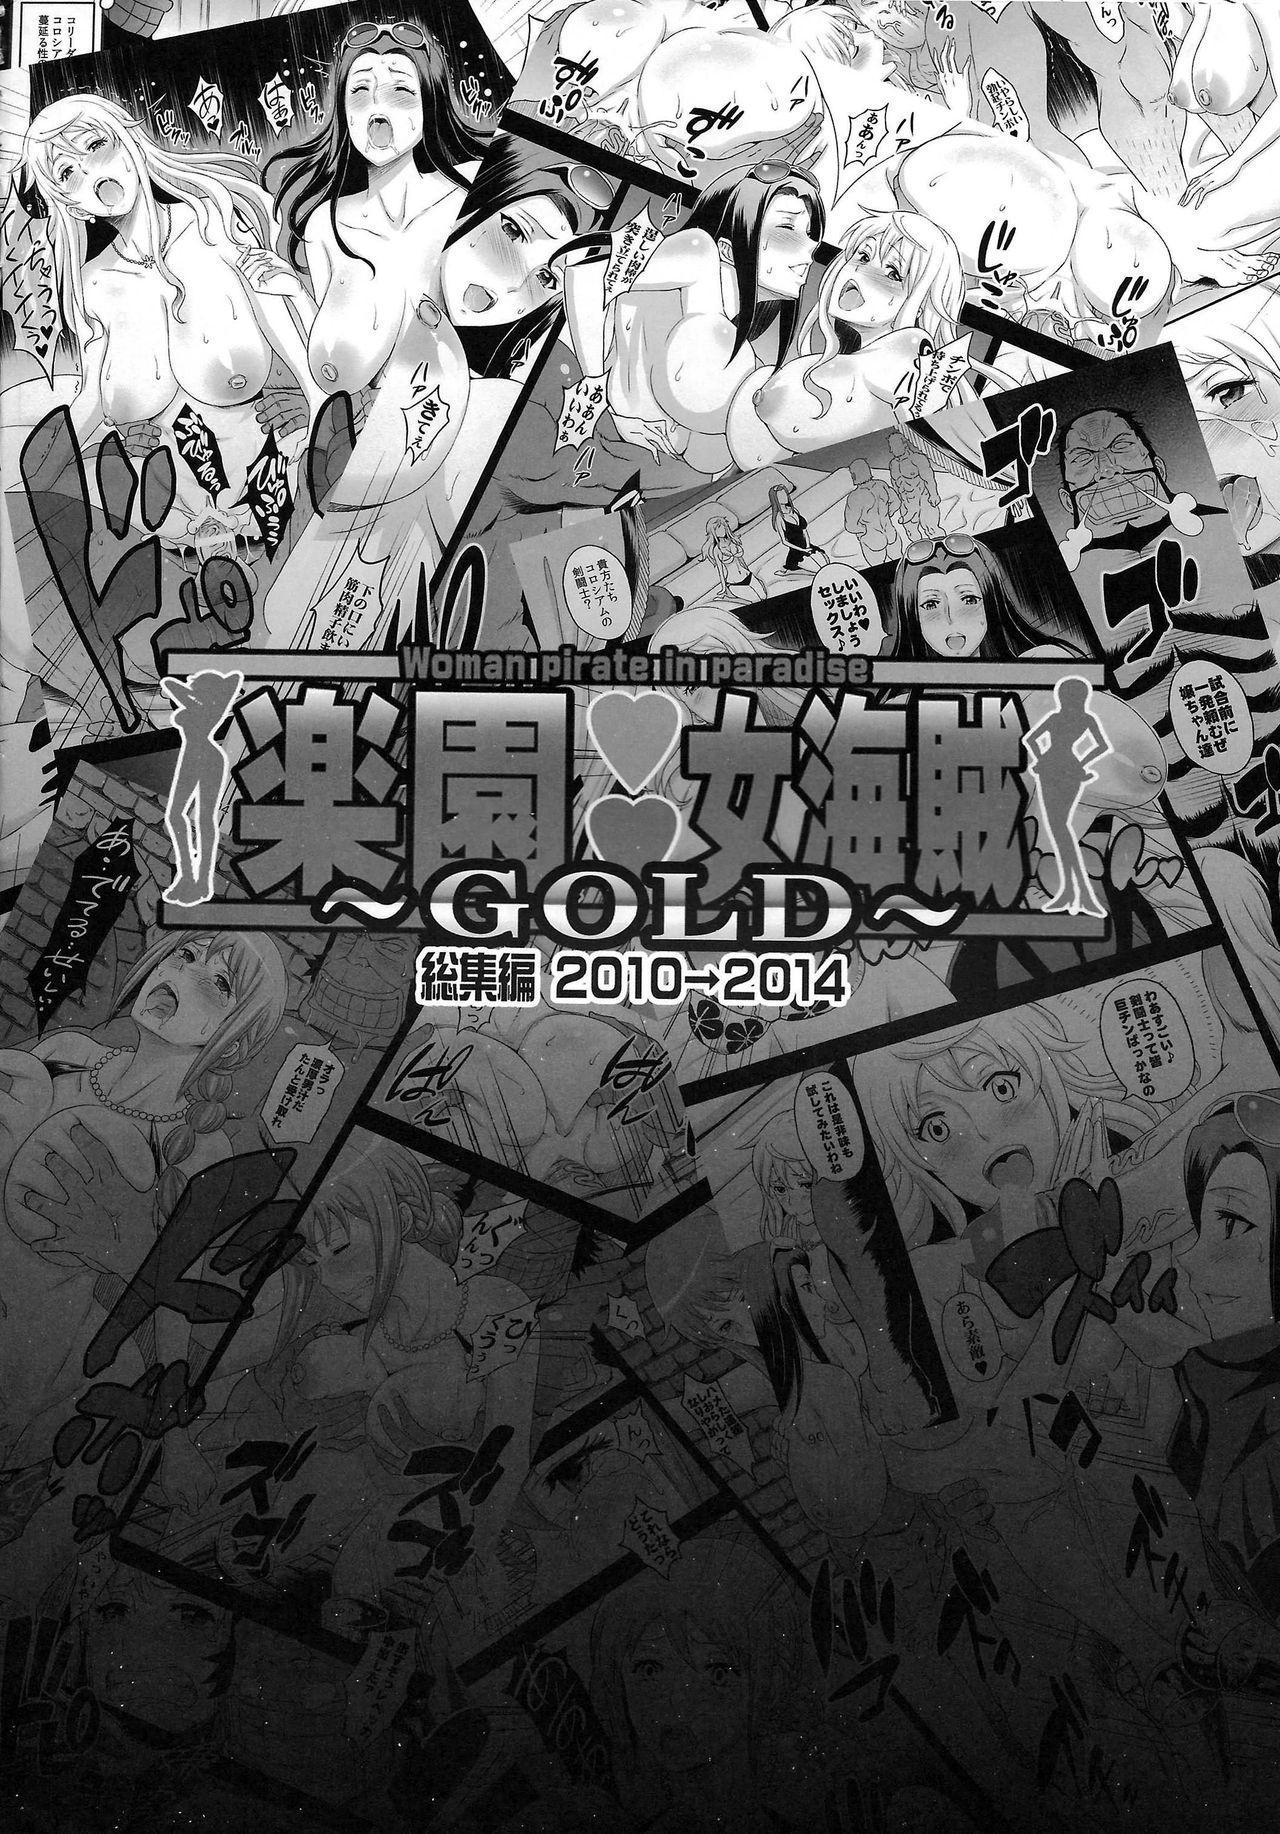 (C87) [Diogenes Club (Haikawa Hemlen)] Rakuen Onna Kaizoku Soushuuhen ~GOLD~ - Woman Pirate in Paradise (One Piece) [English] {doujin-moe.us} [Incomplete] 11